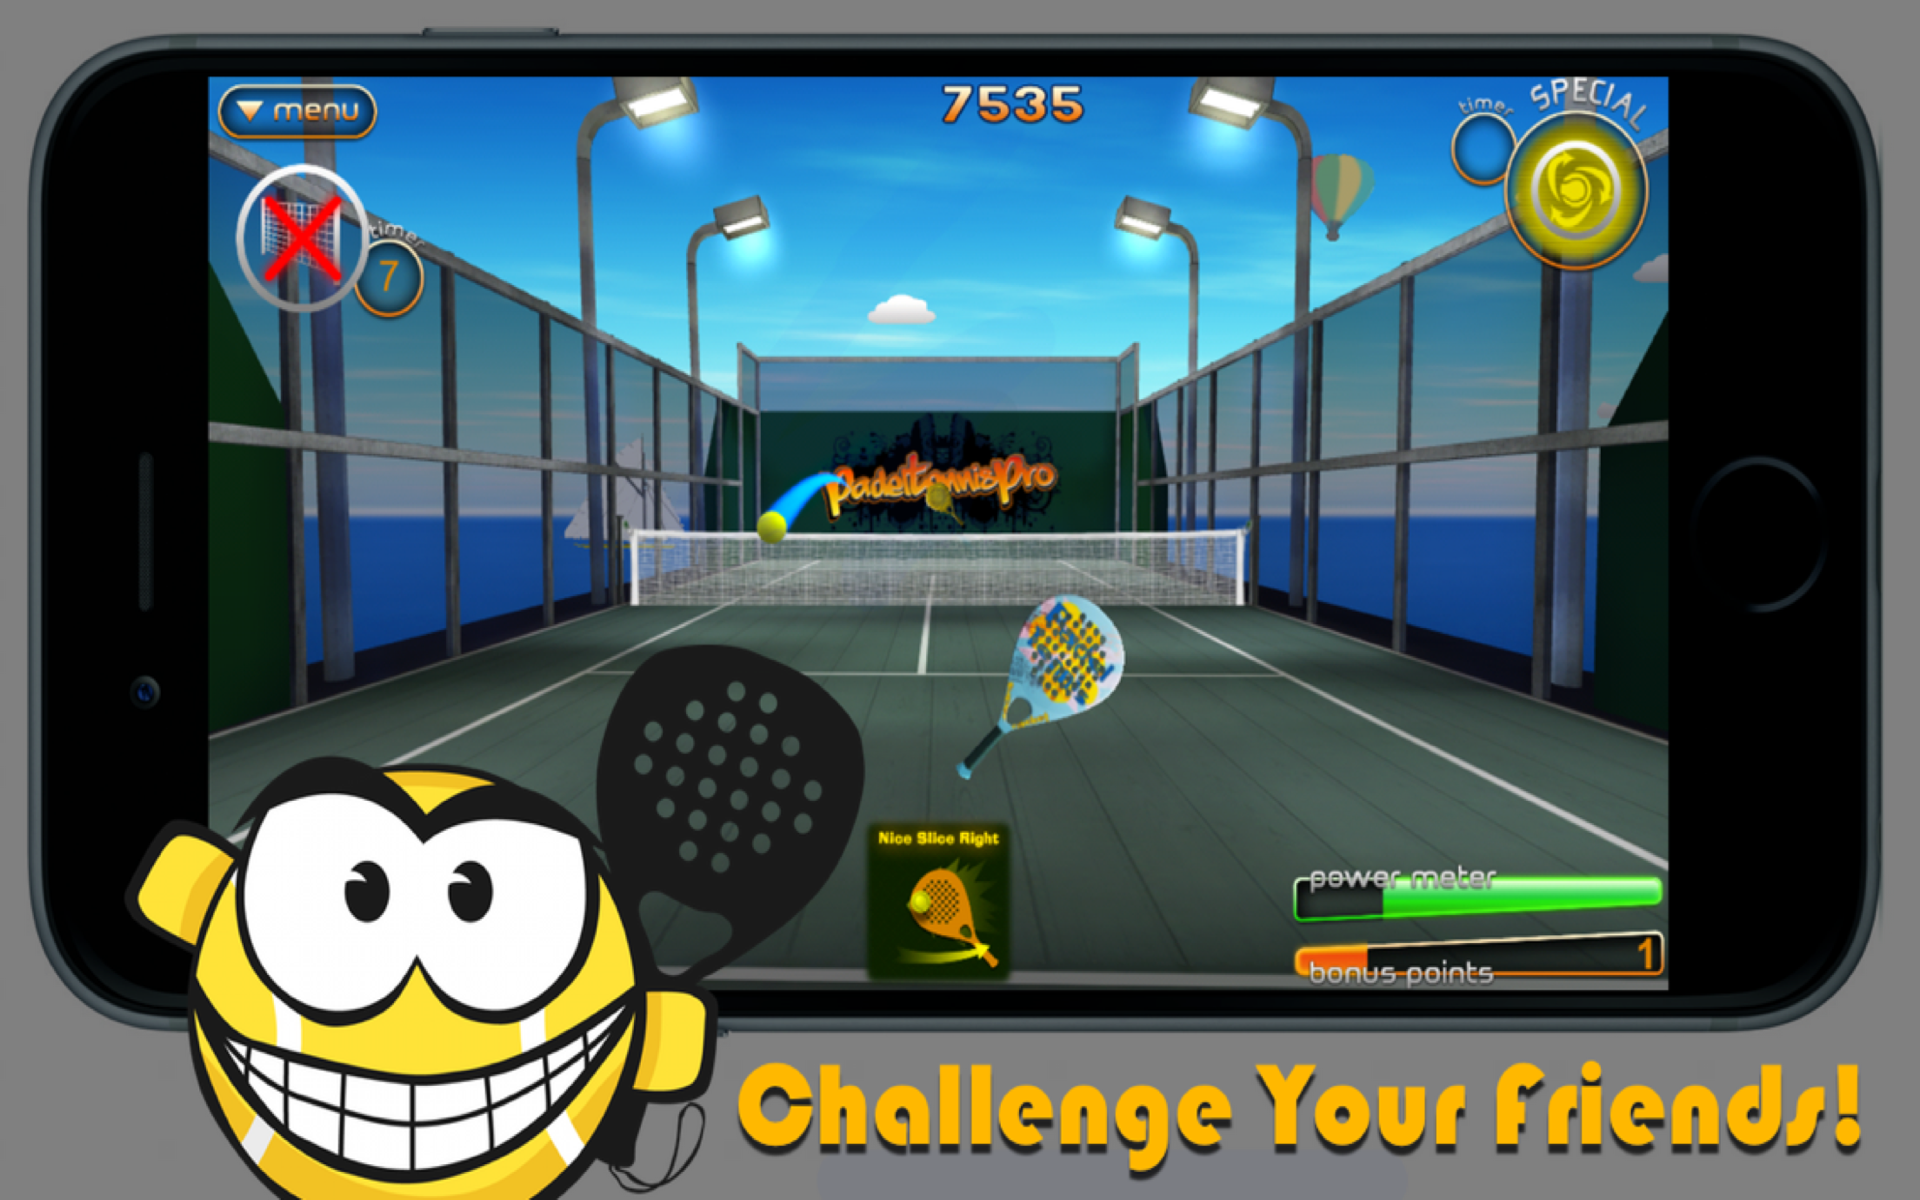 Amazon.com: Padel Tennis Pro - World Tour Edition: Appstore ...